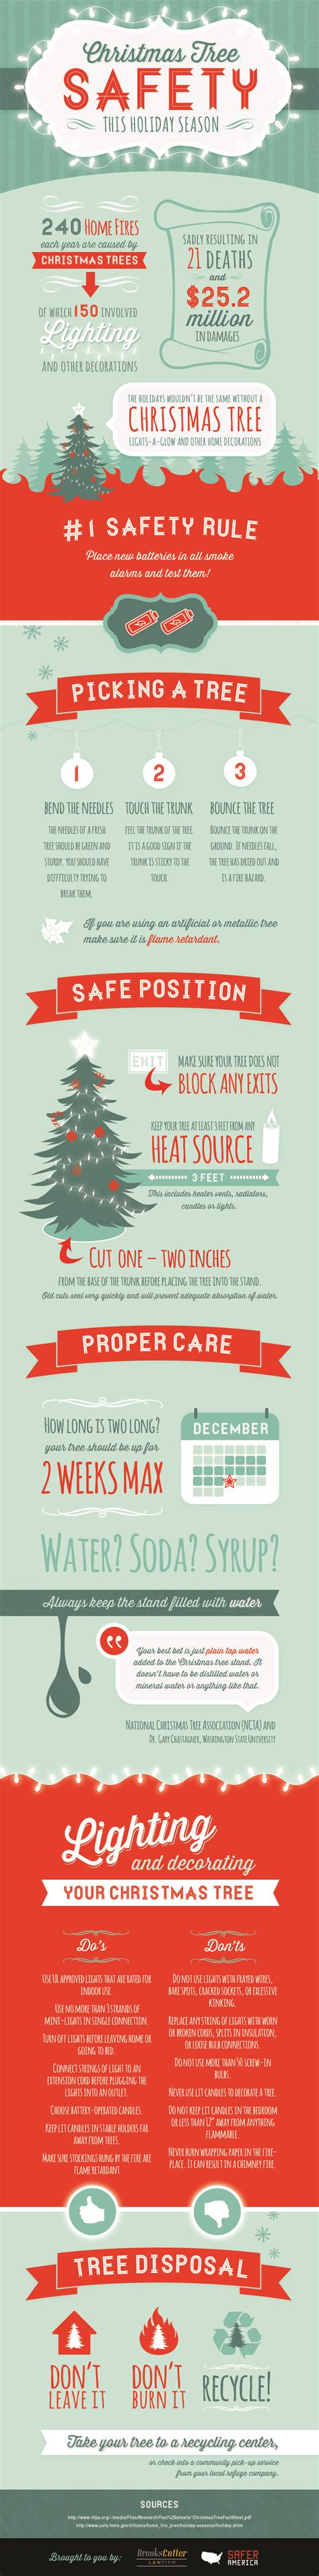 christmas tree safety tips infographic christmas trees